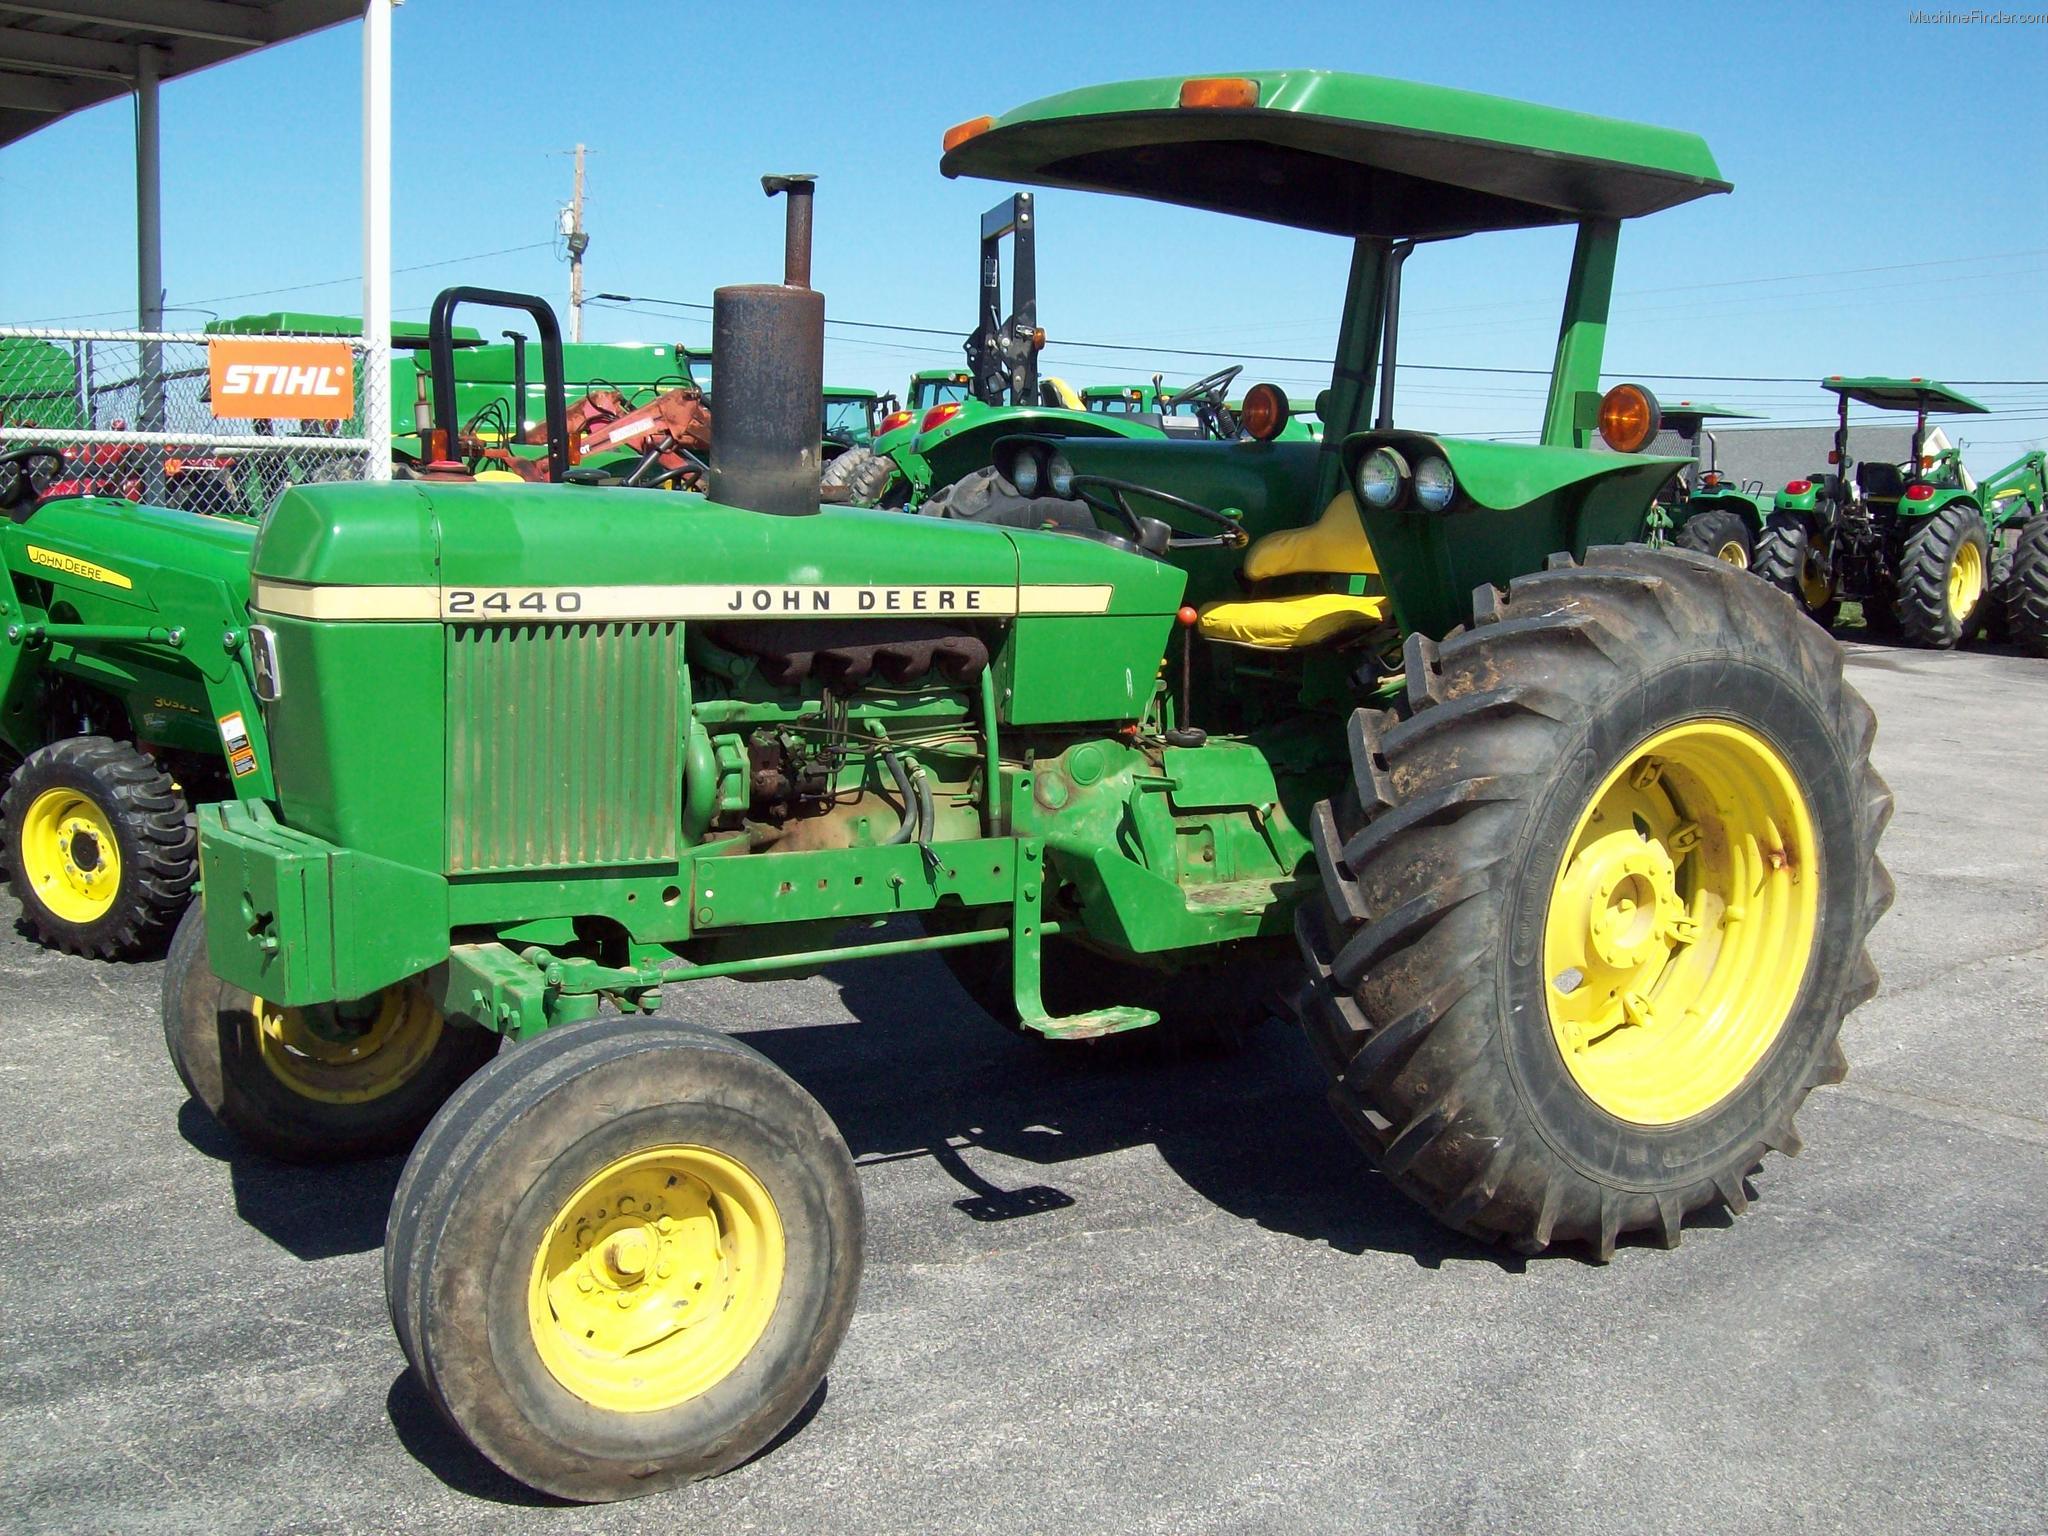 1976 John Deere 2440 Tractors - Utility (40-100hp) - John ...